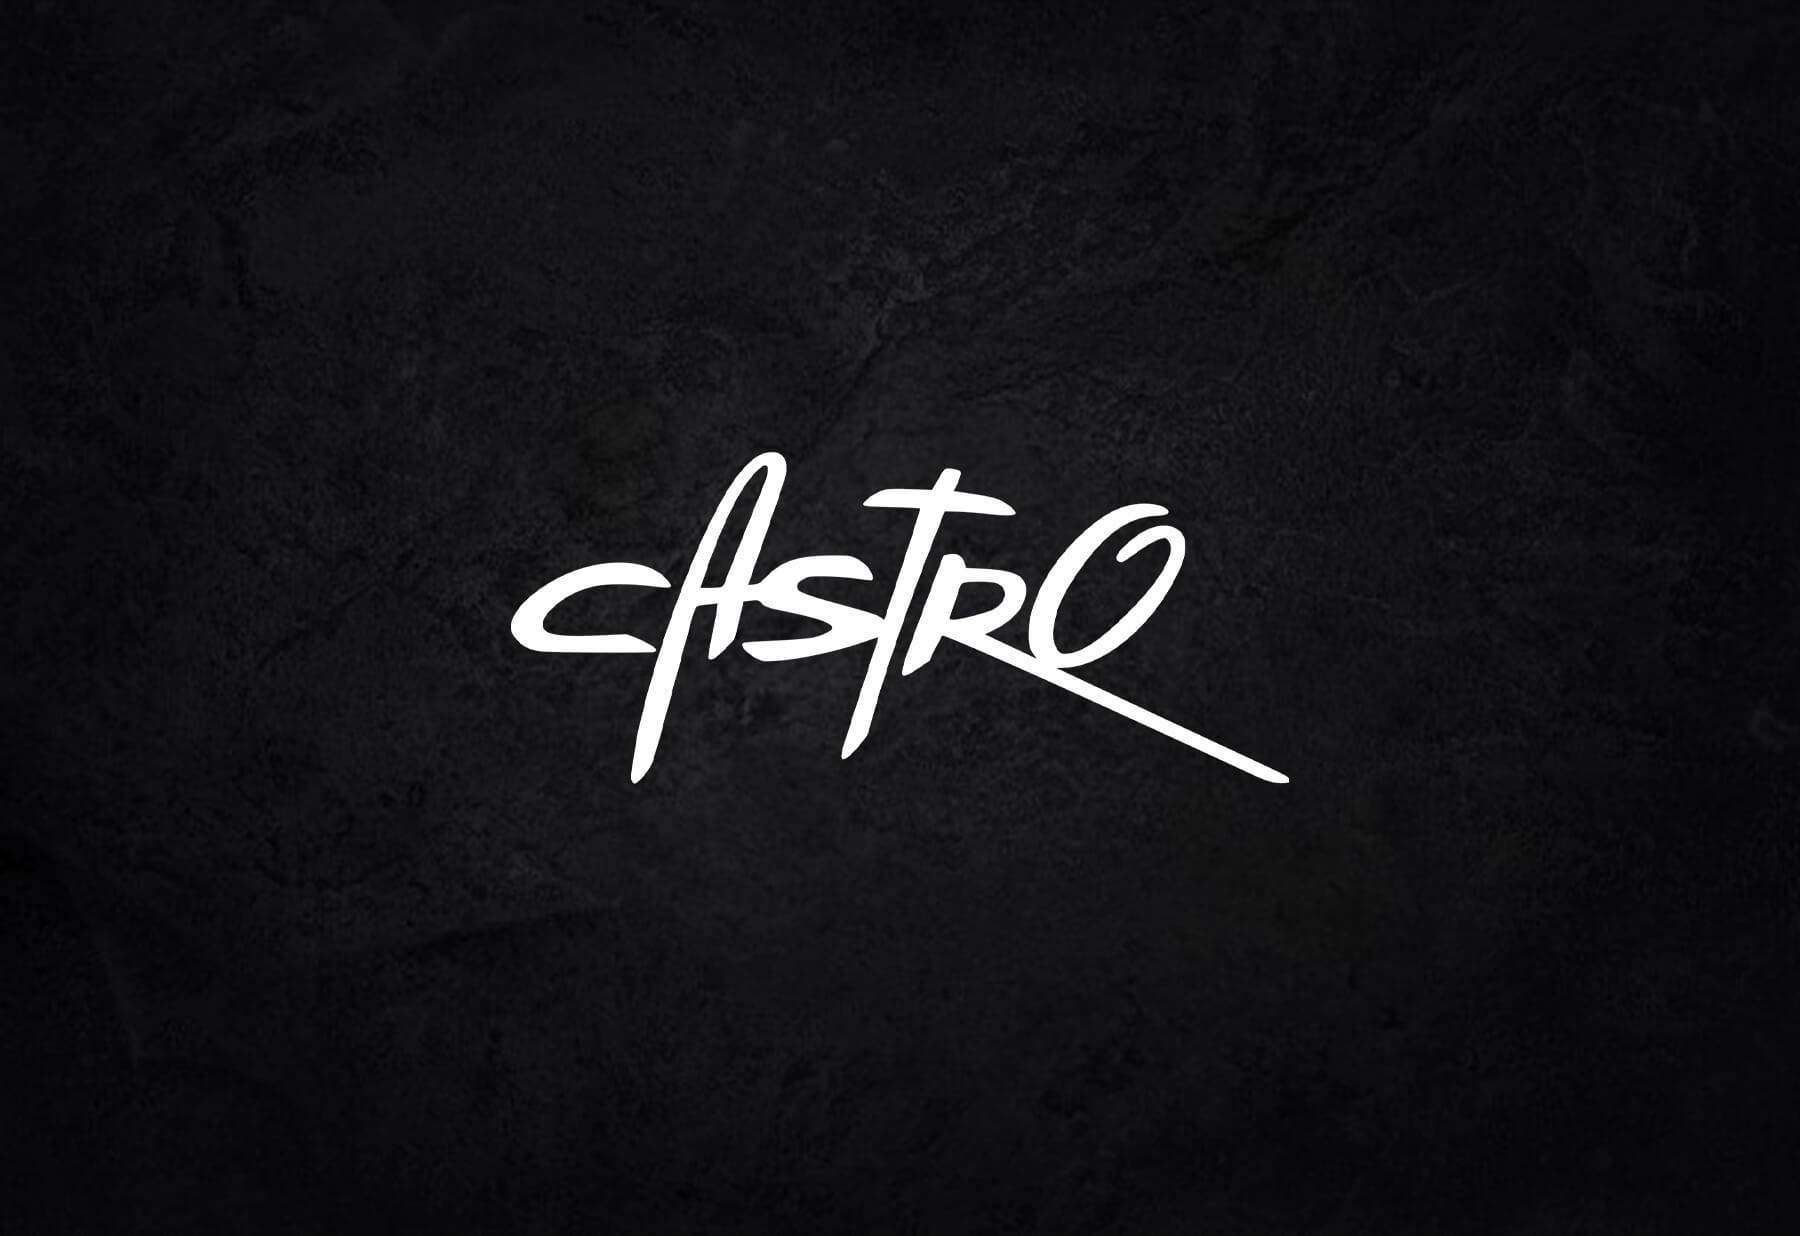 castro_main